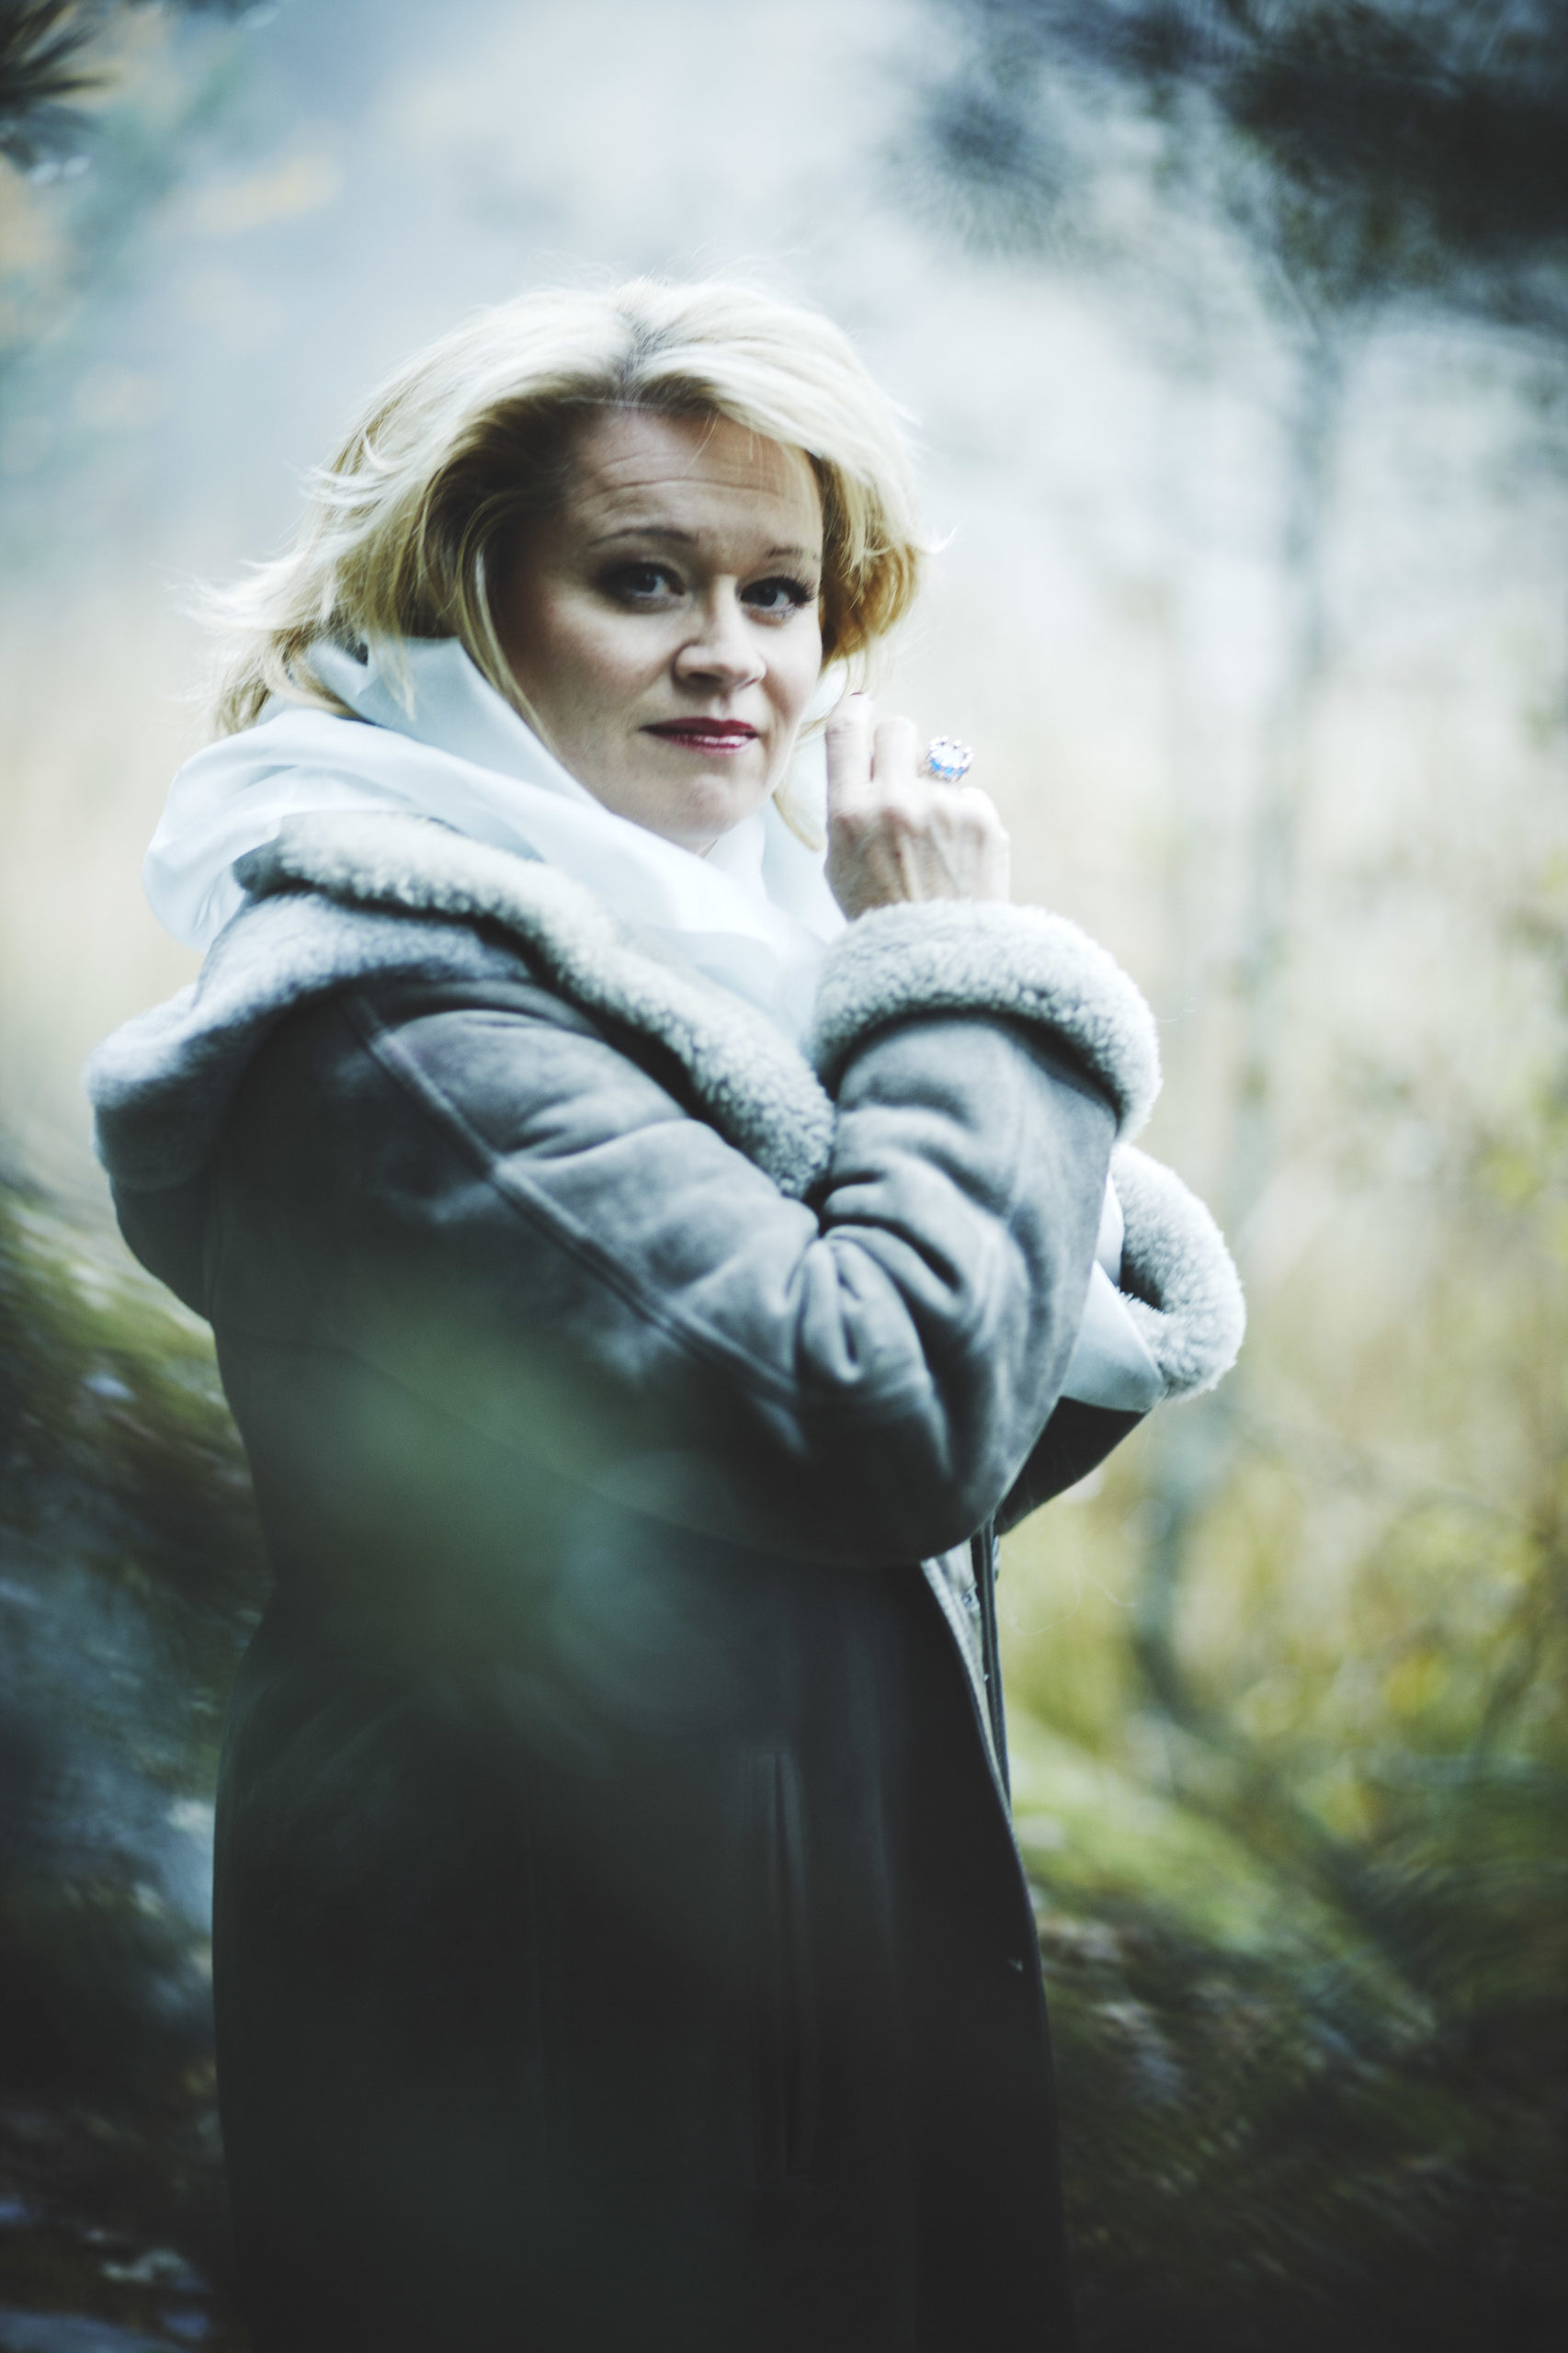 © Foto Per Kristiansen